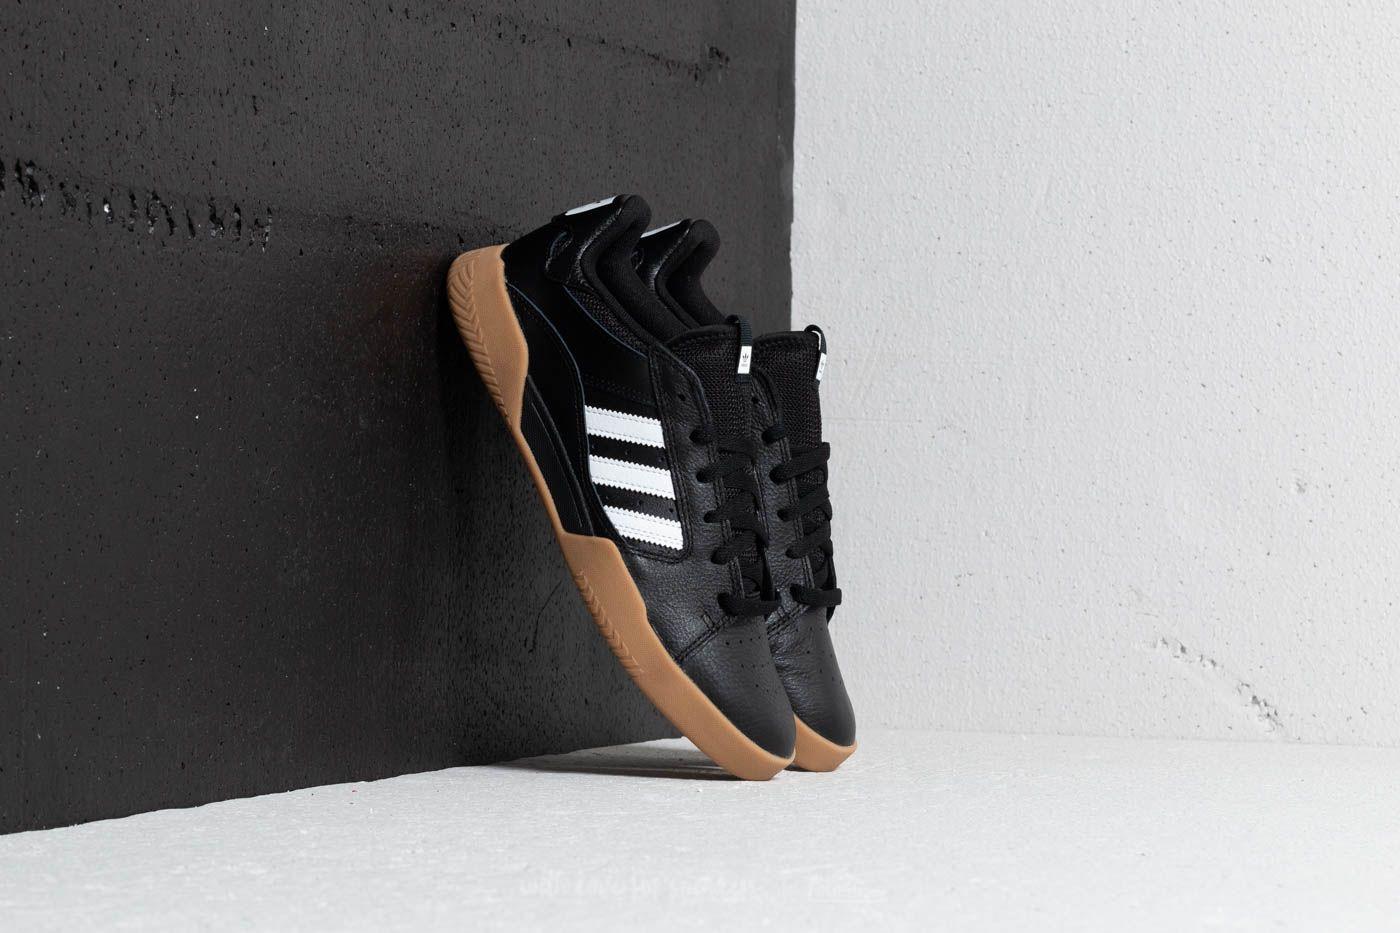 adidas VRX Low Core Black/ Ftw White/ Gum 4 za skvělou cenu 1 713 Kč koupíte na Footshop.cz